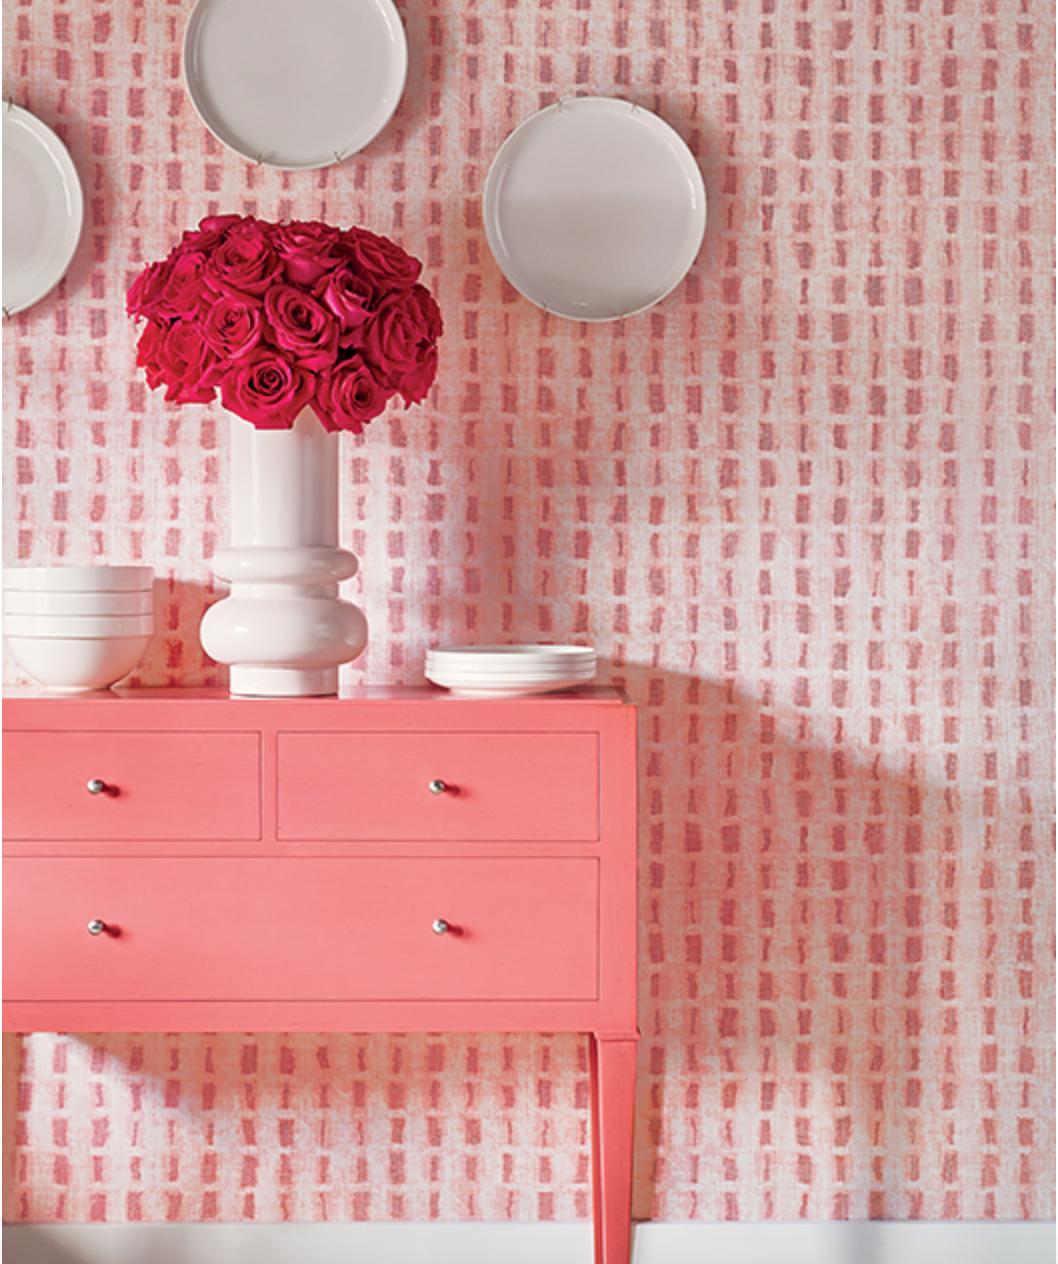 Thibaut Wallpapers Coral wallpaper, Wallpaper, Wallpaper